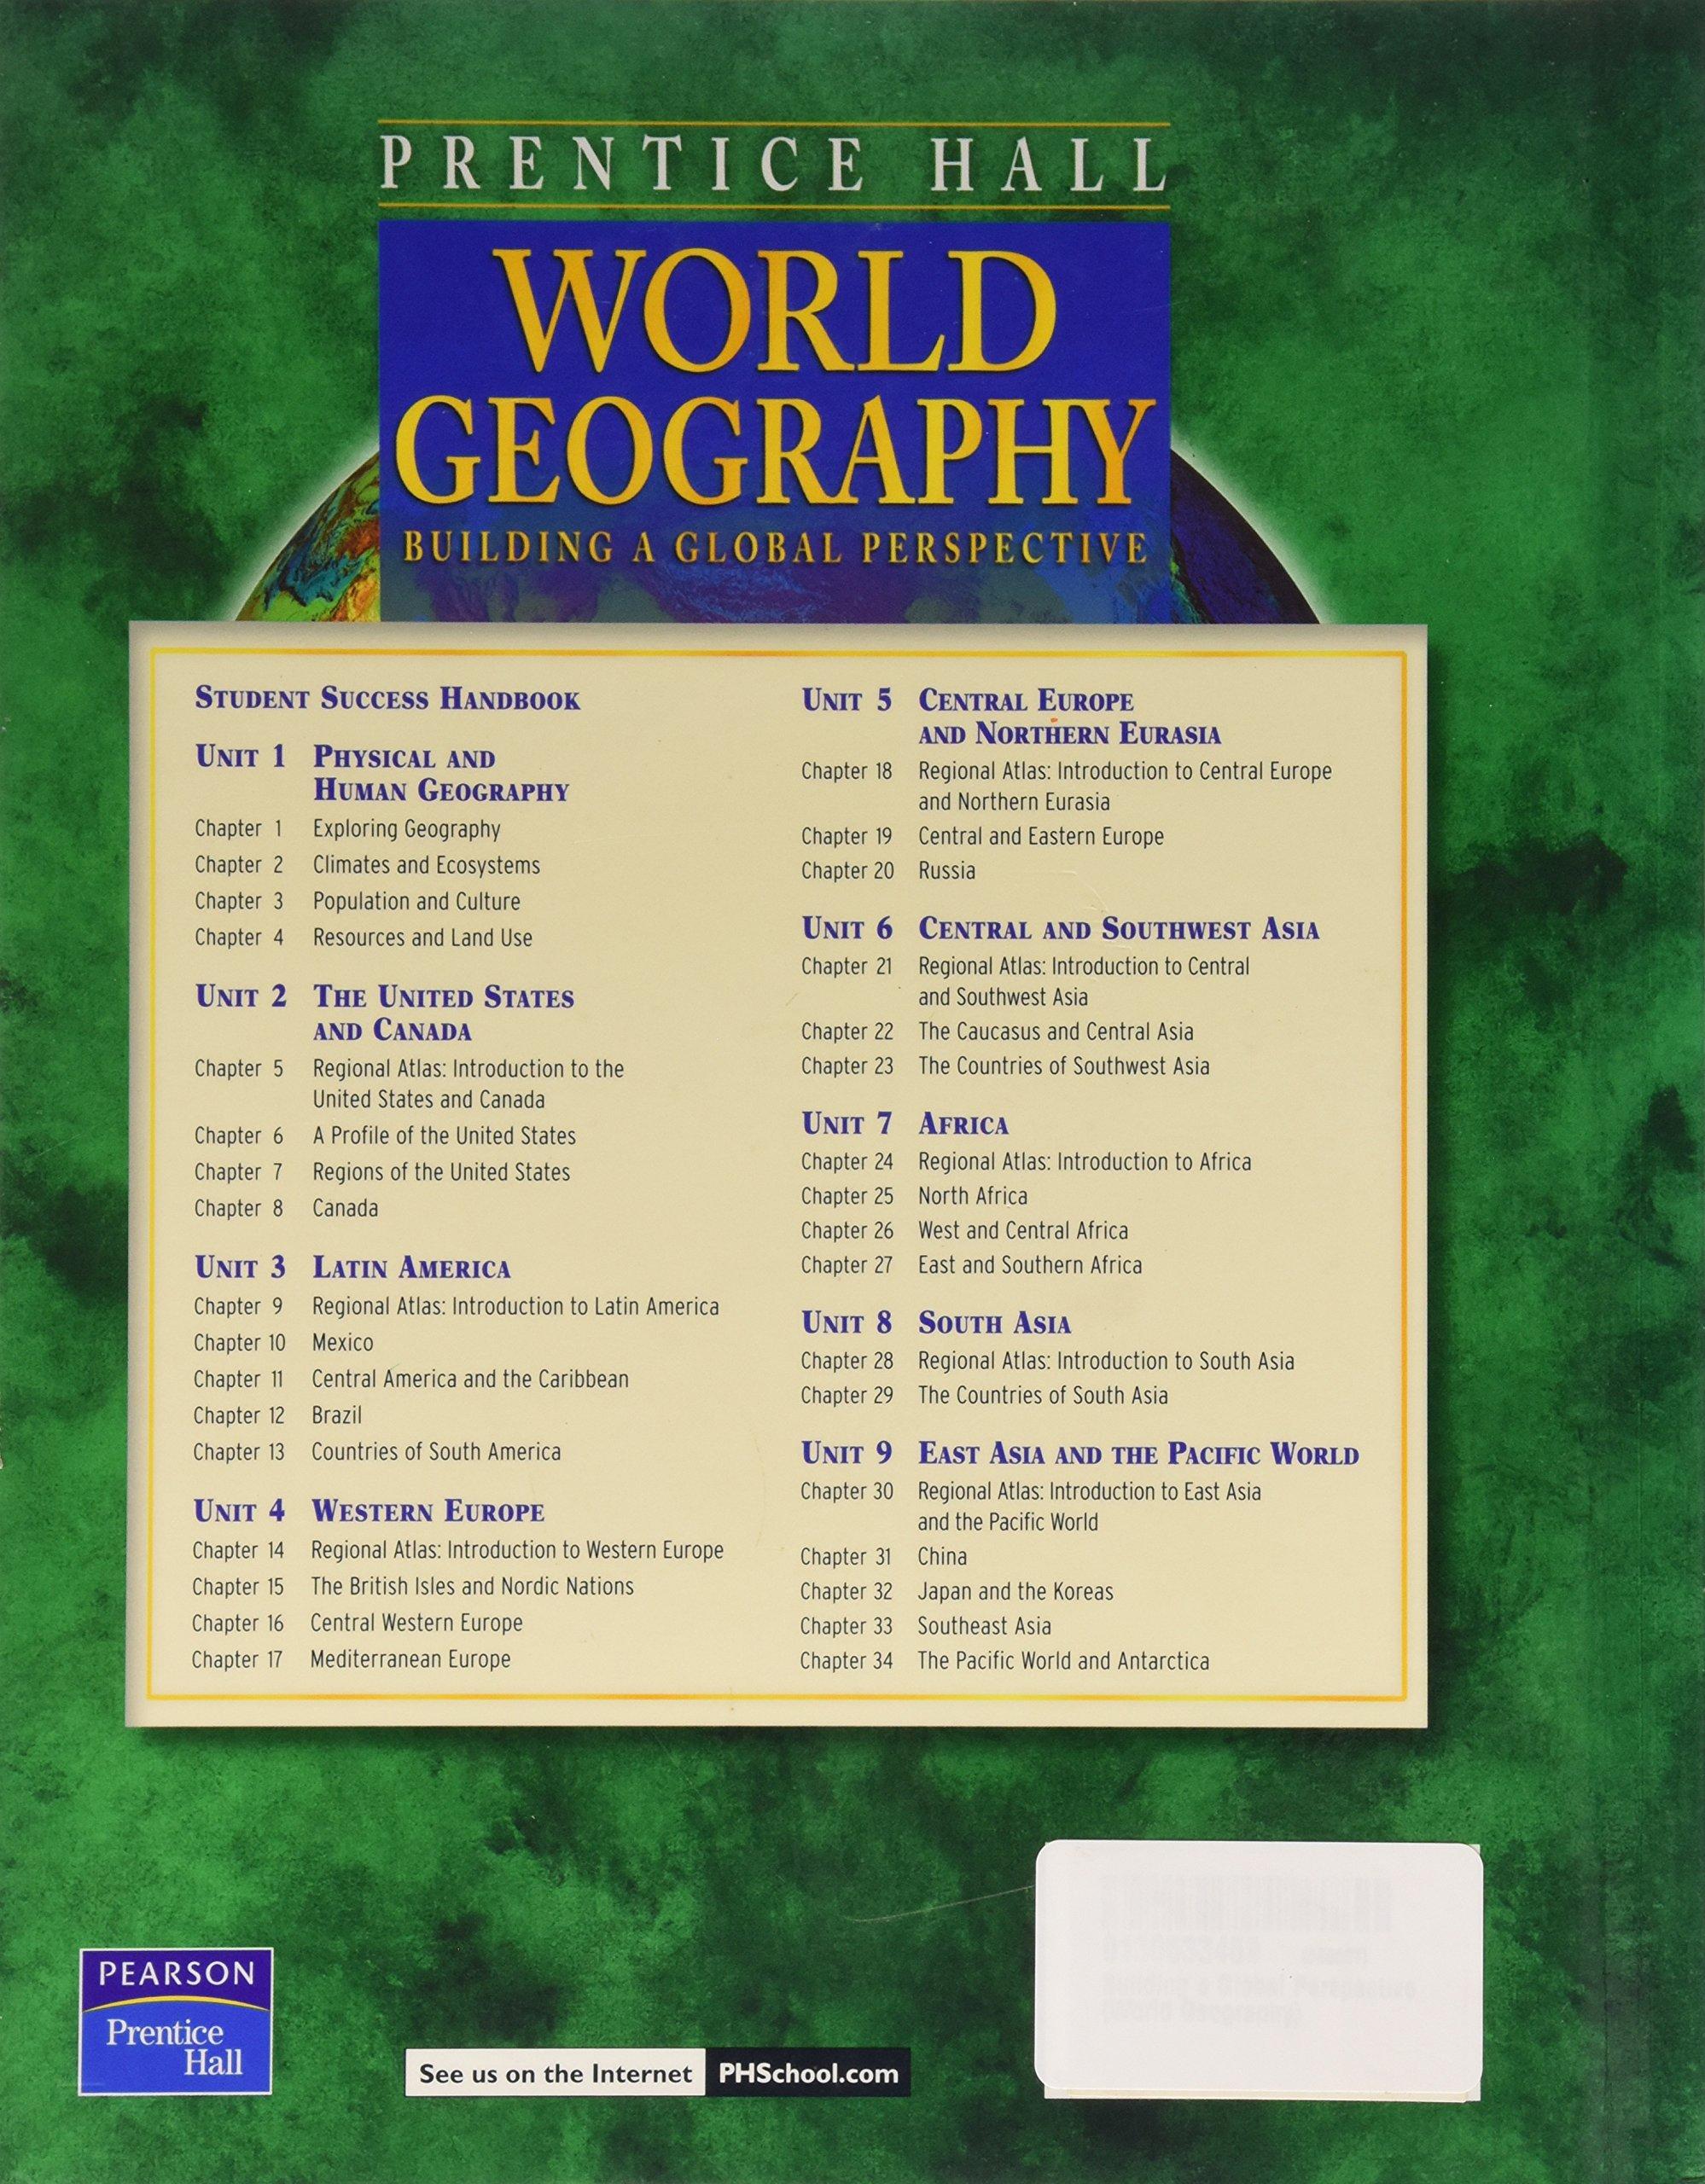 Prentice hall world geography teacher edition 2002 isbn 0130533459 prentice hall world geography teacher edition 2002 isbn 0130533459 baerwald 9780130533456 amazon books sciox Images